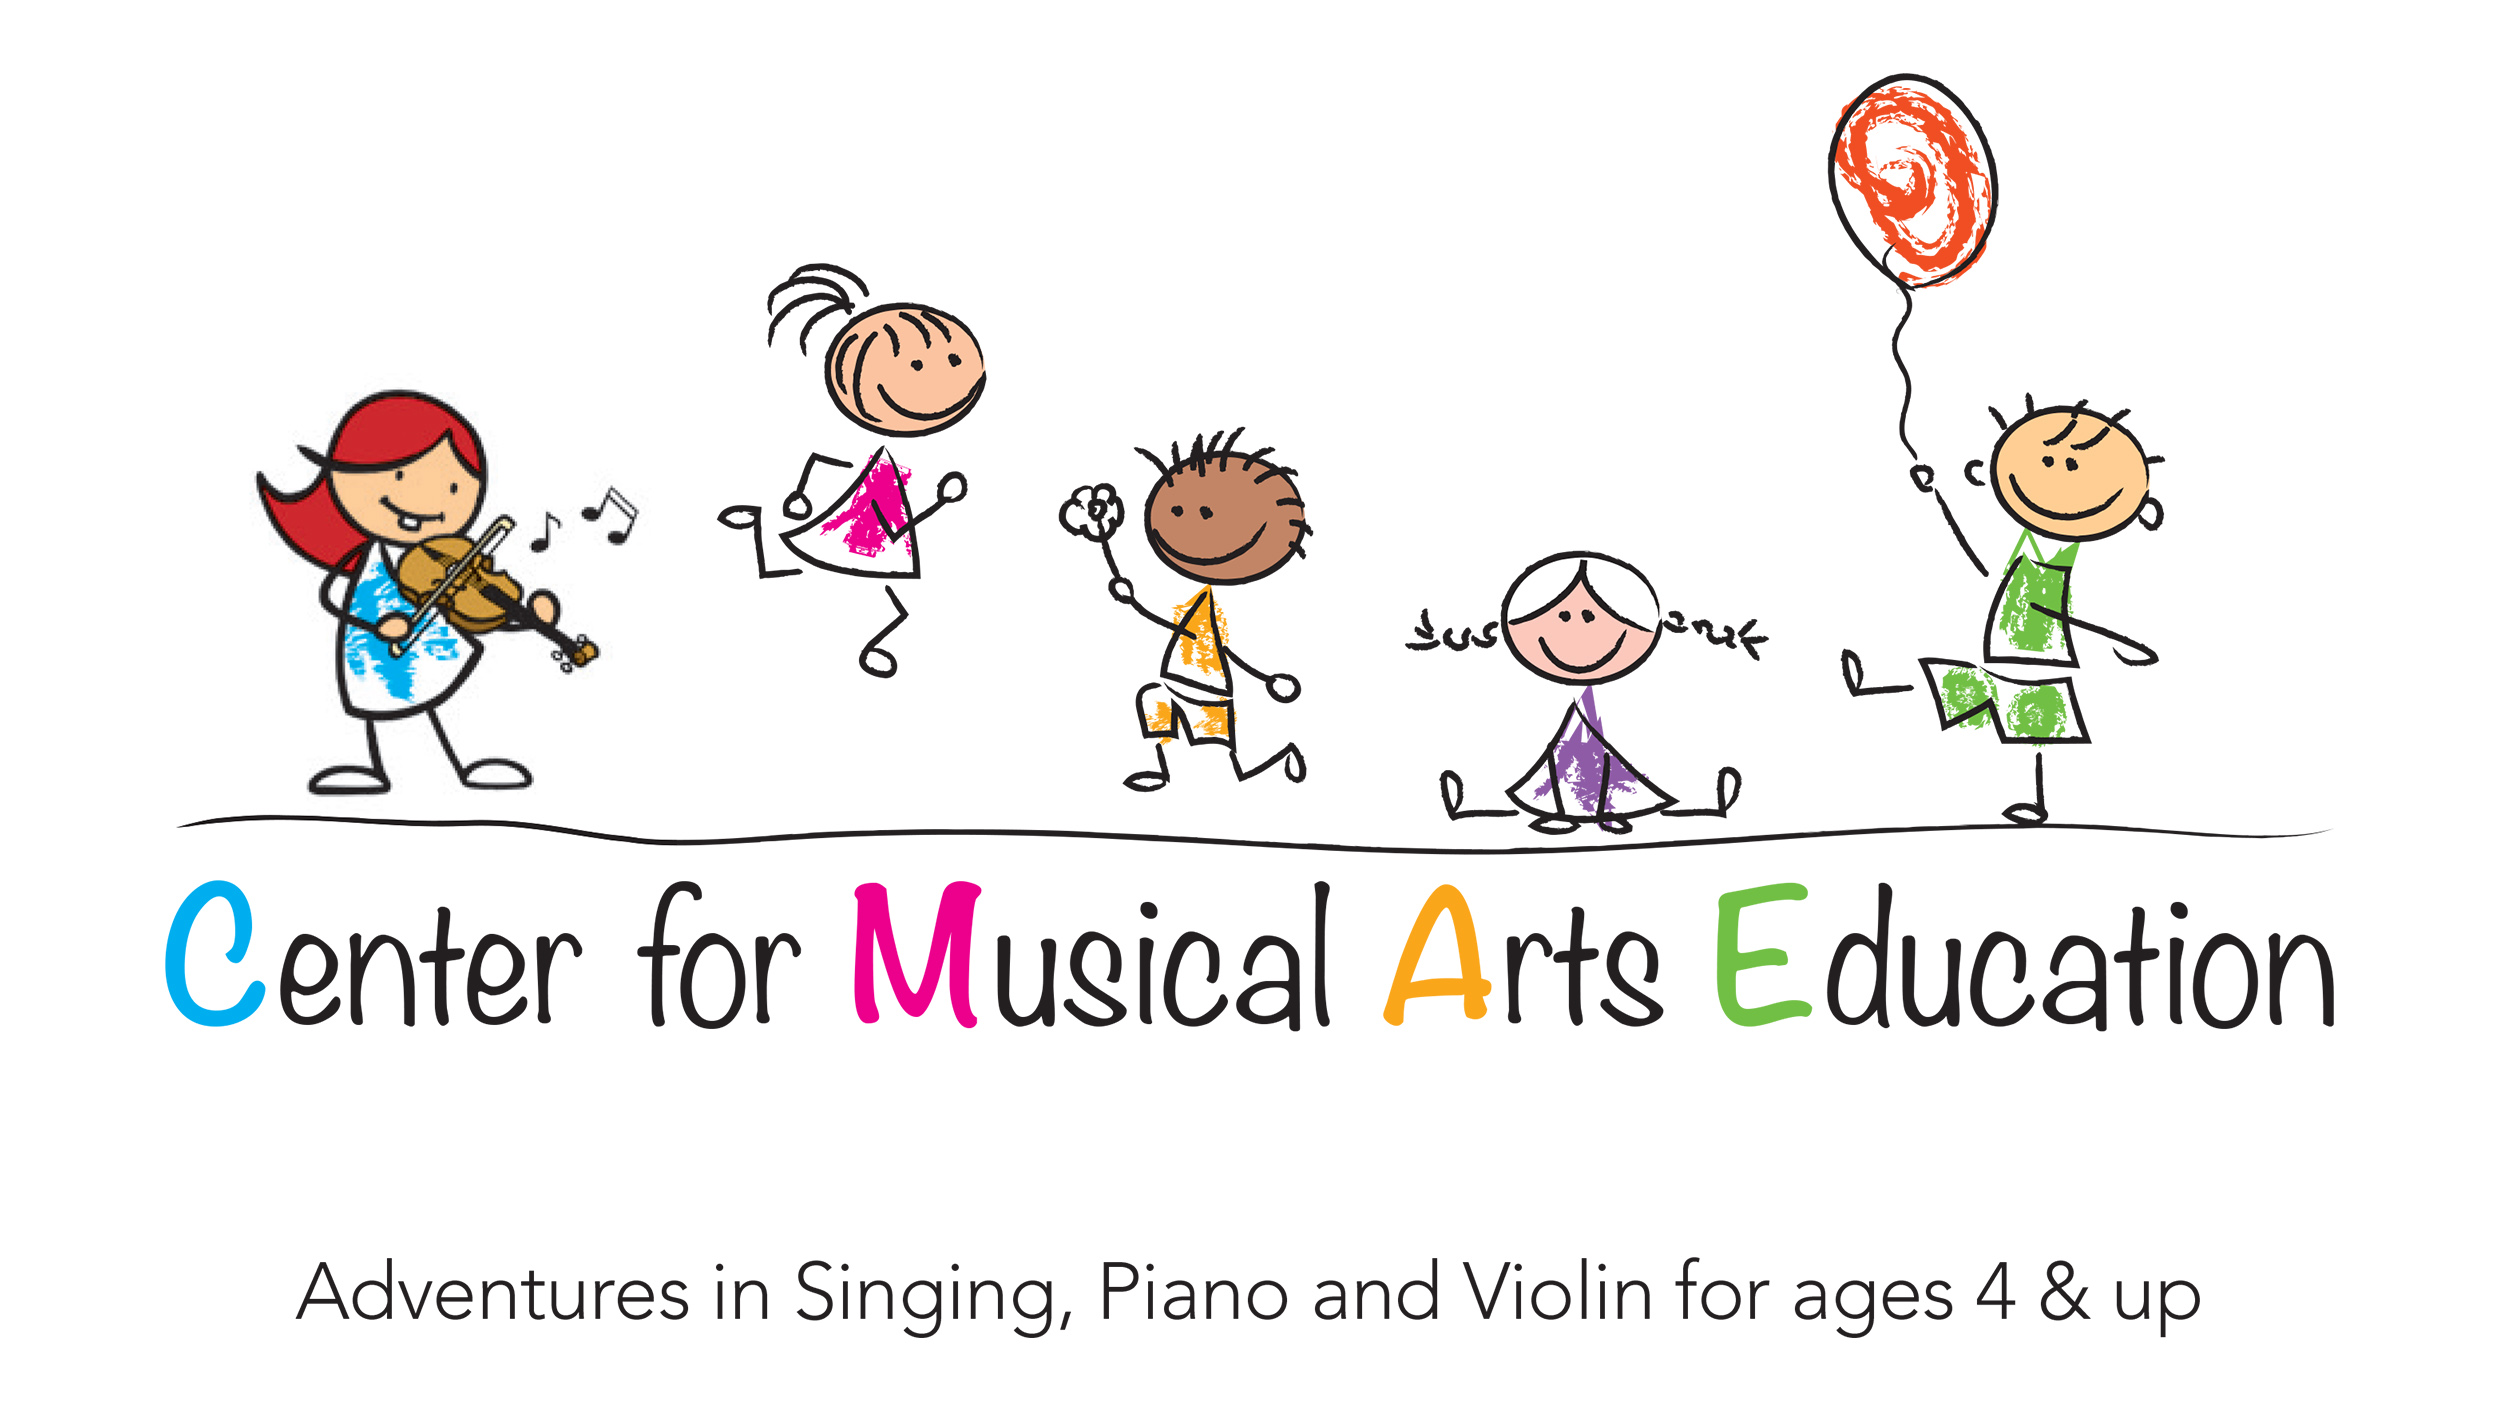 Center-for-Musical-Arts-Education-Logos-Brand-Identity.jpg